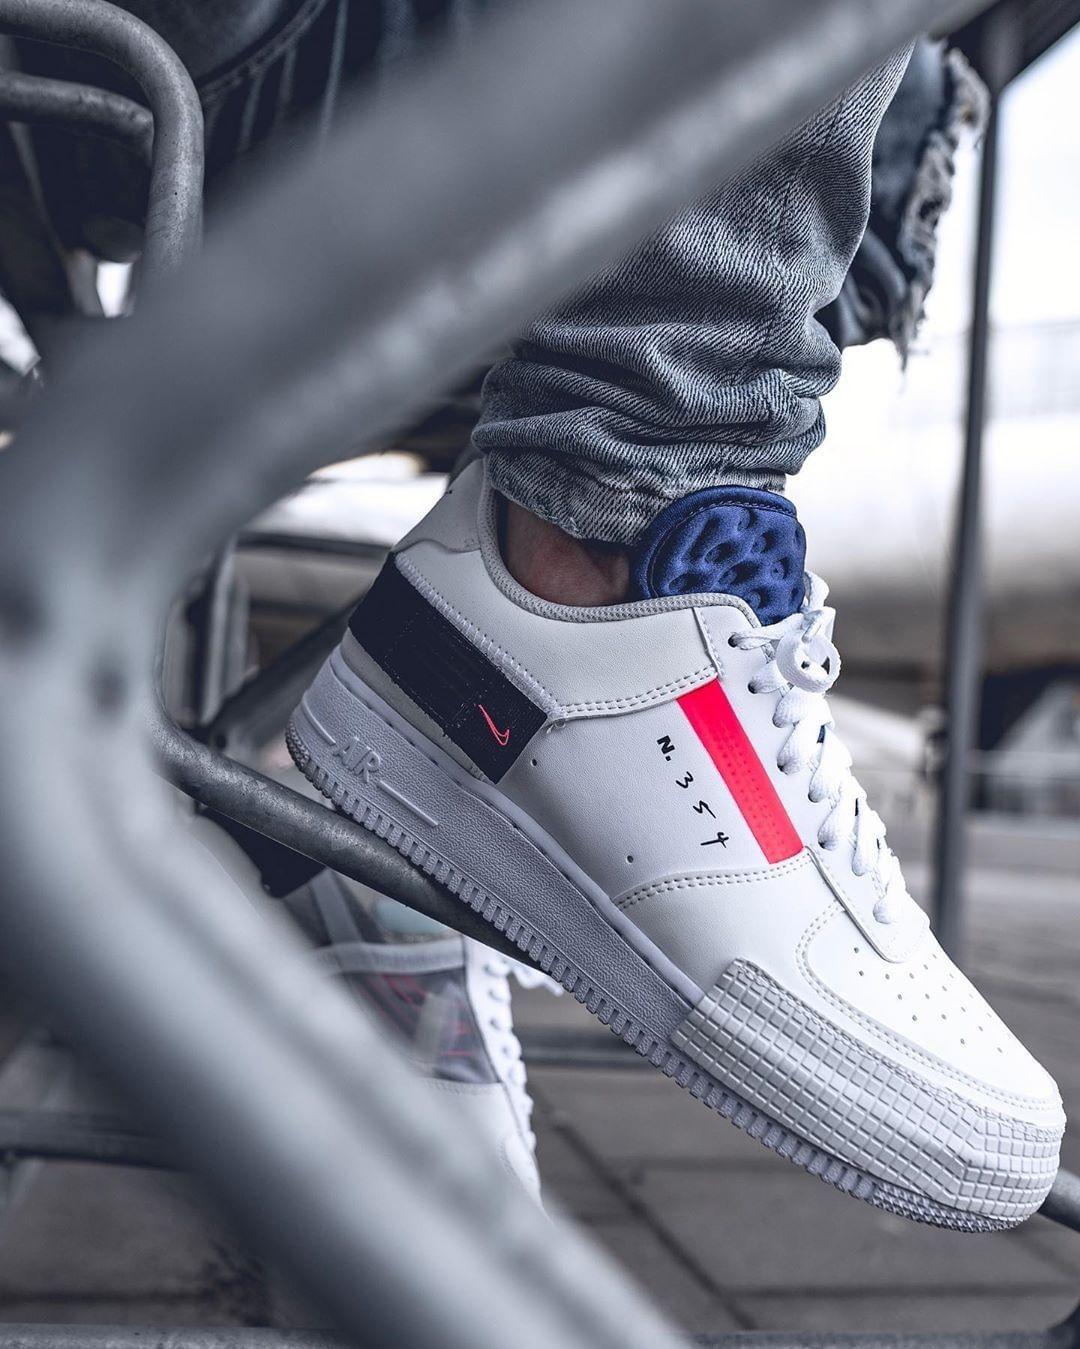 Air Force 1 Low Drop Type White en 2020 | Nike air force